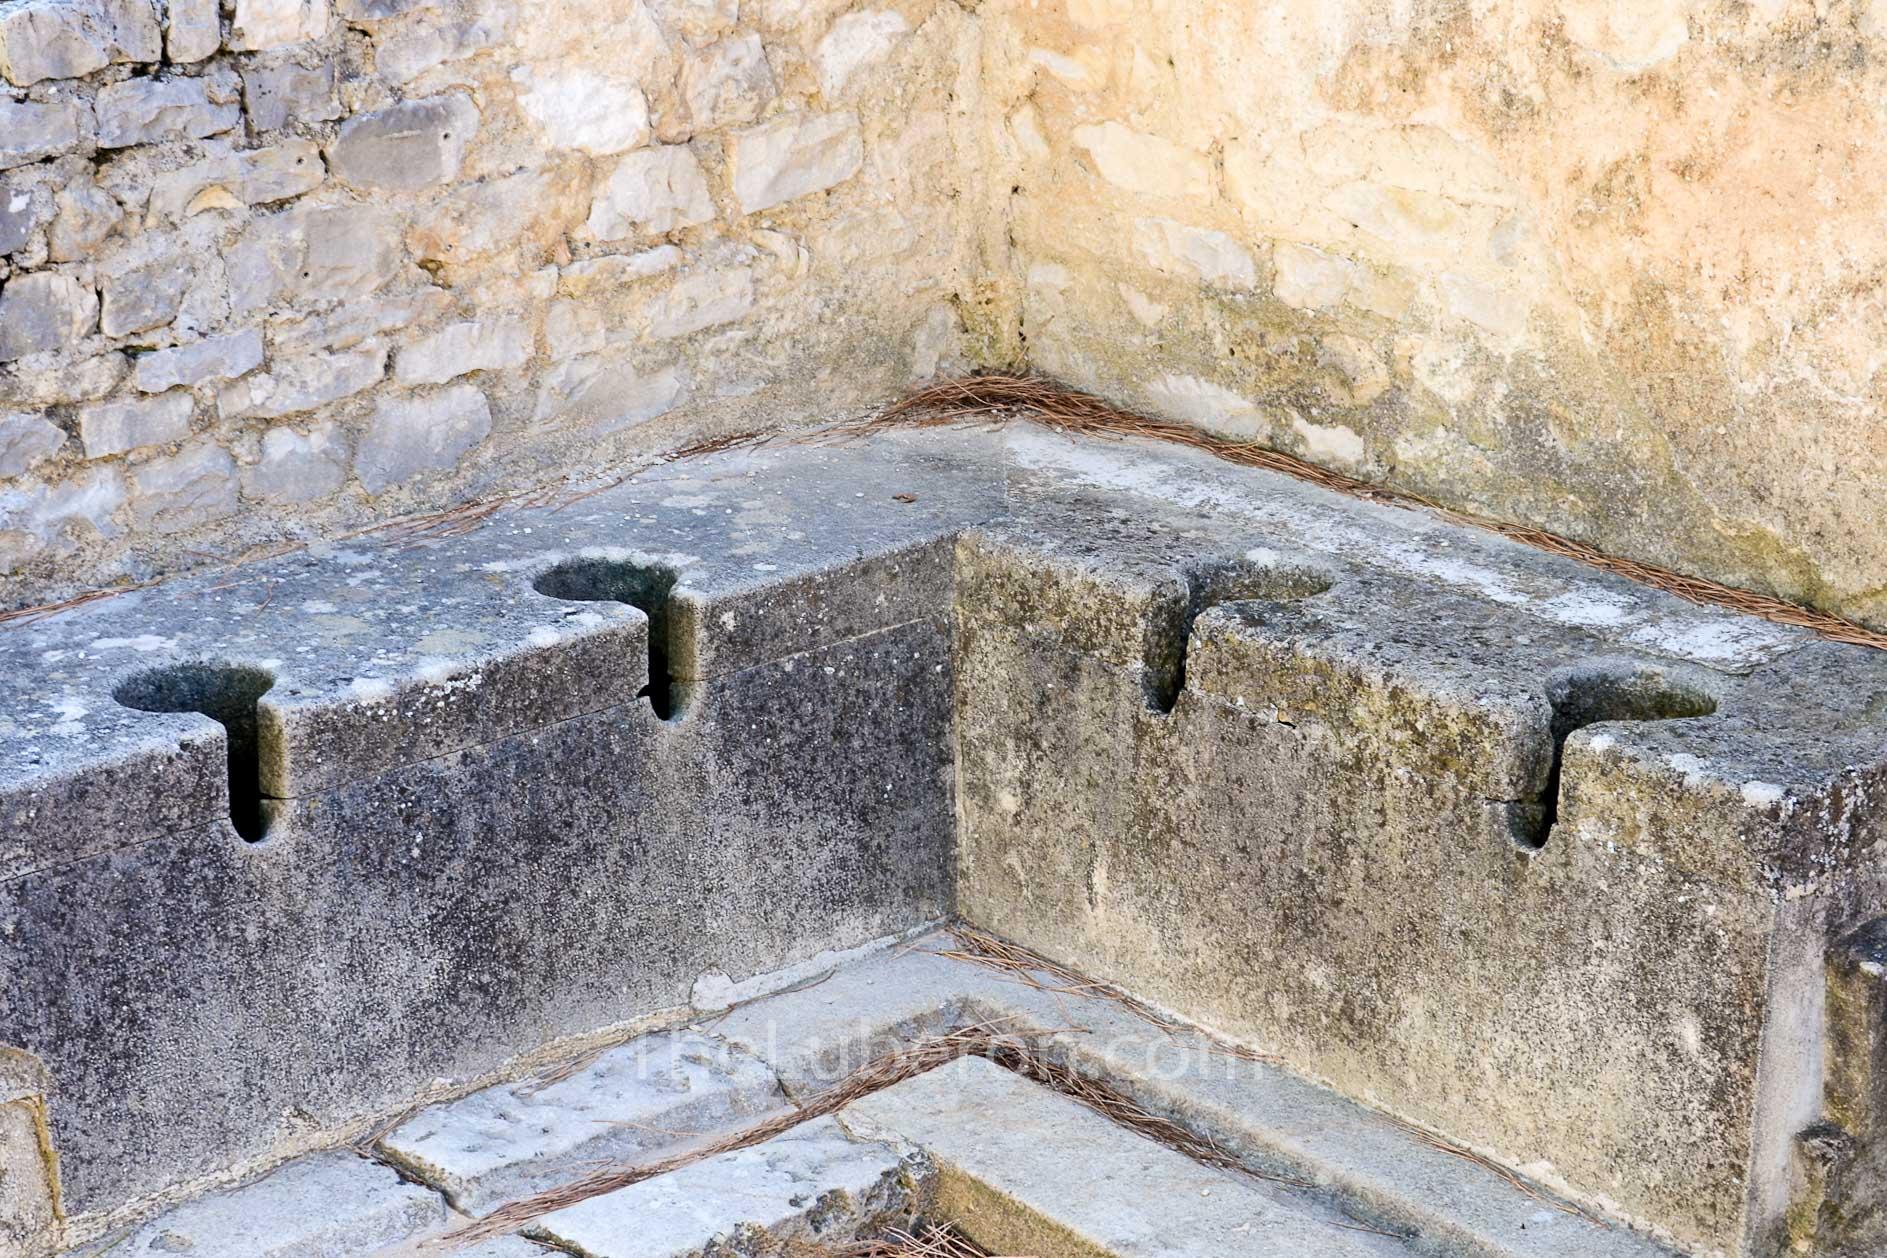 Roman toilets at Vaison-la-Romaine